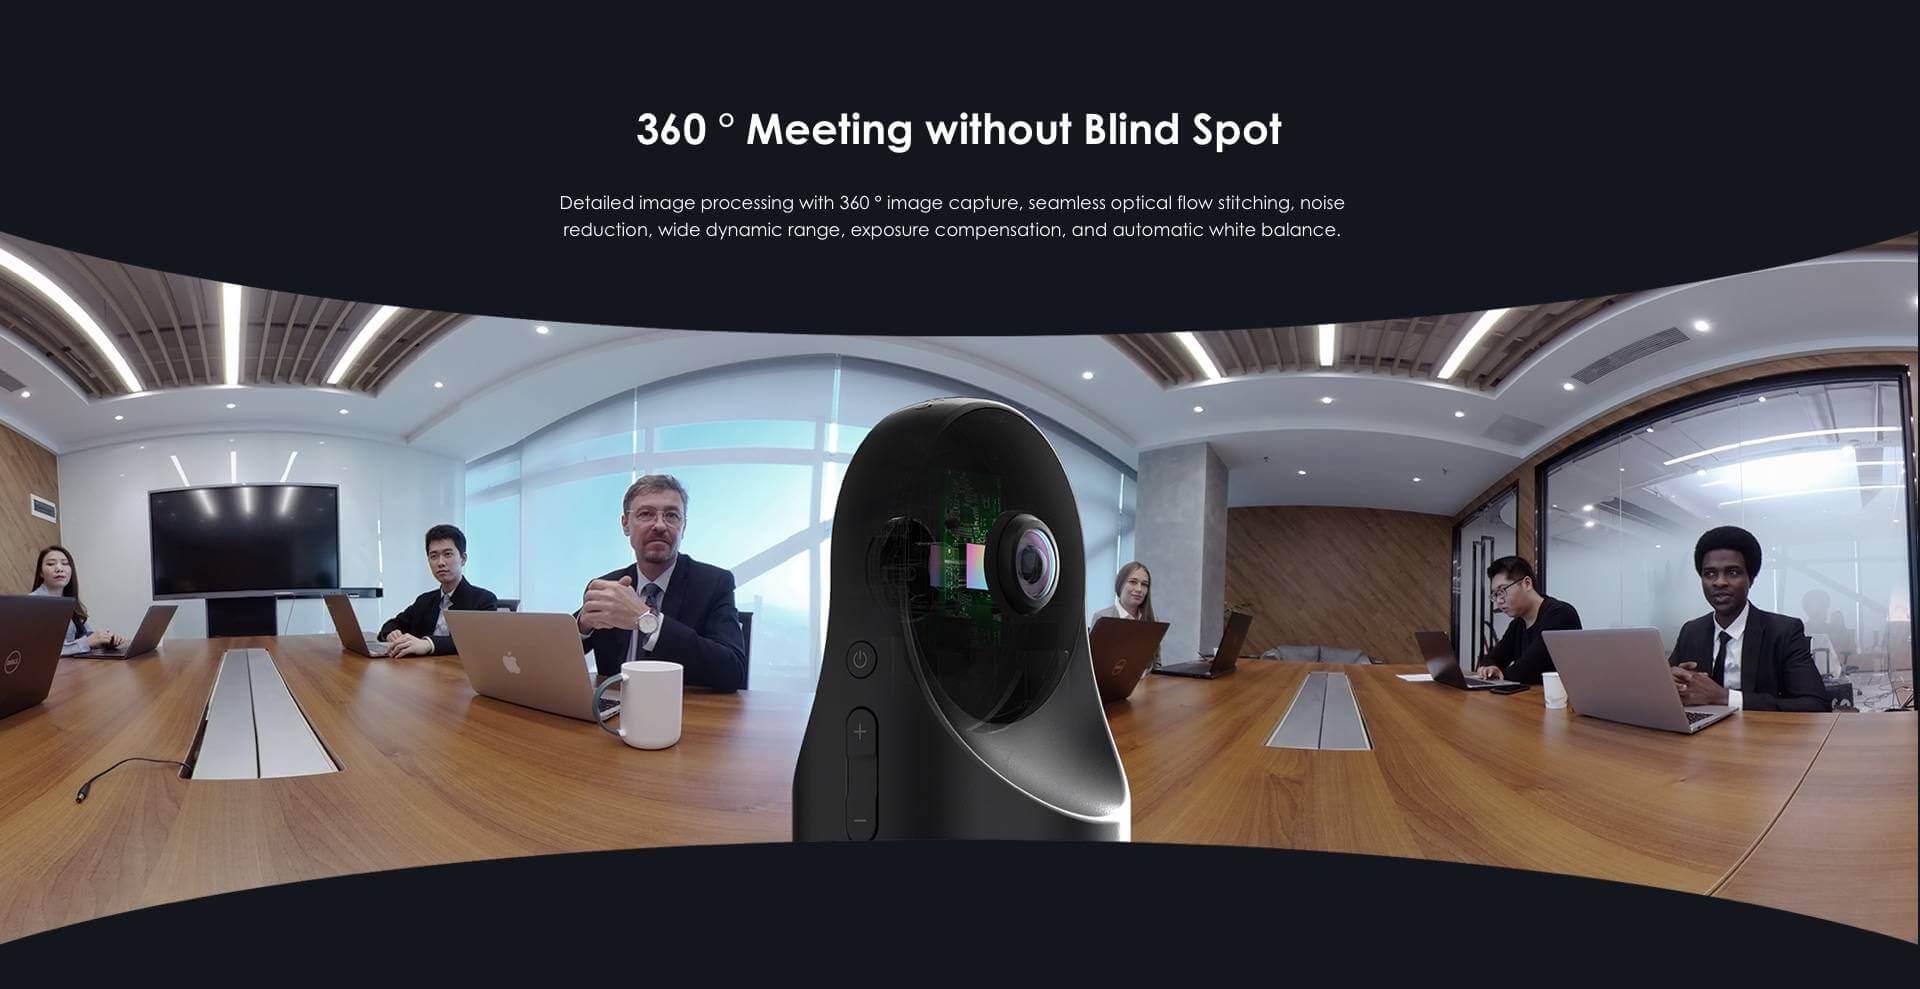 Kandao Meeting Pro 360° 6